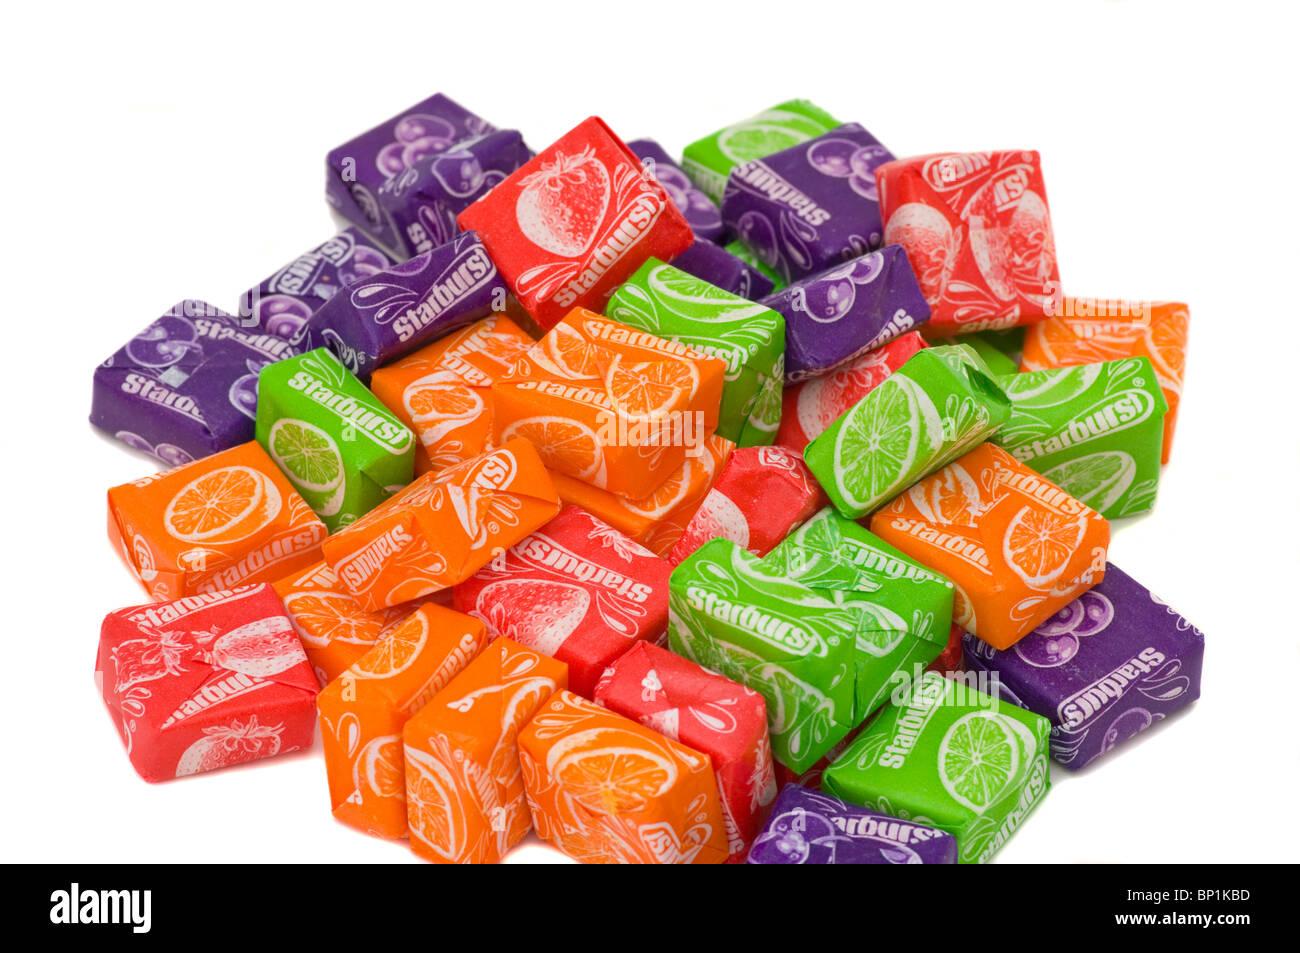 Starburst Sweets - Stock Image